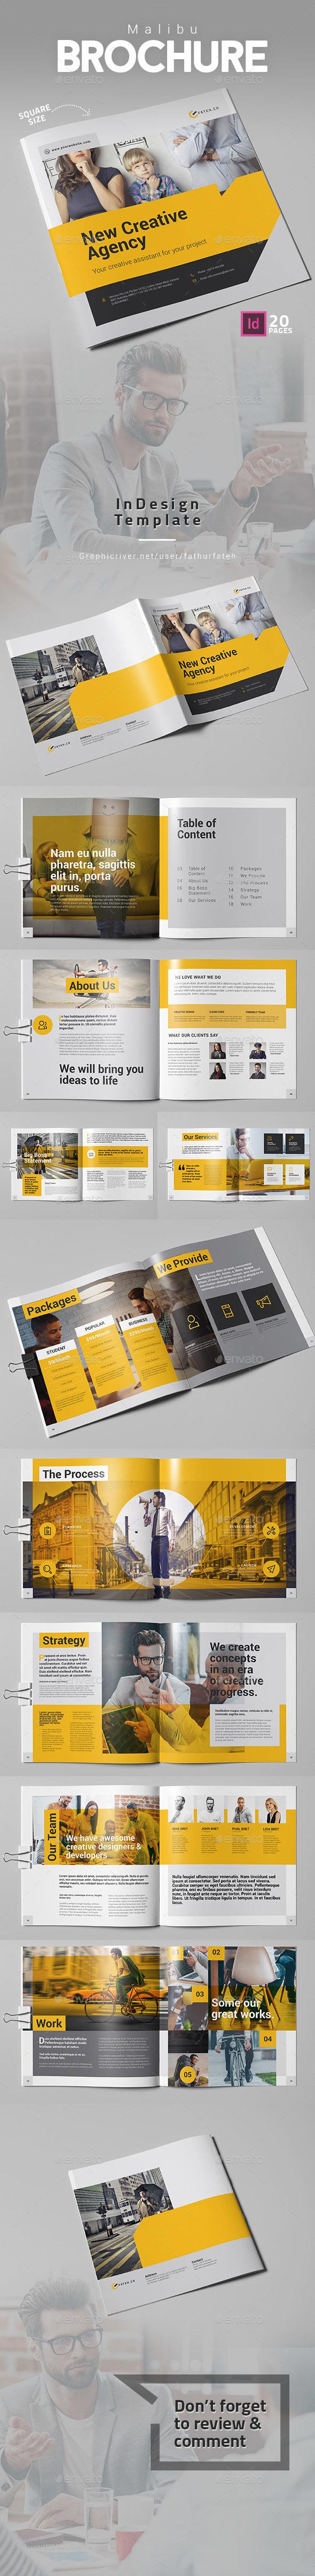 Malibu Brochure Square - Corporate Brochures